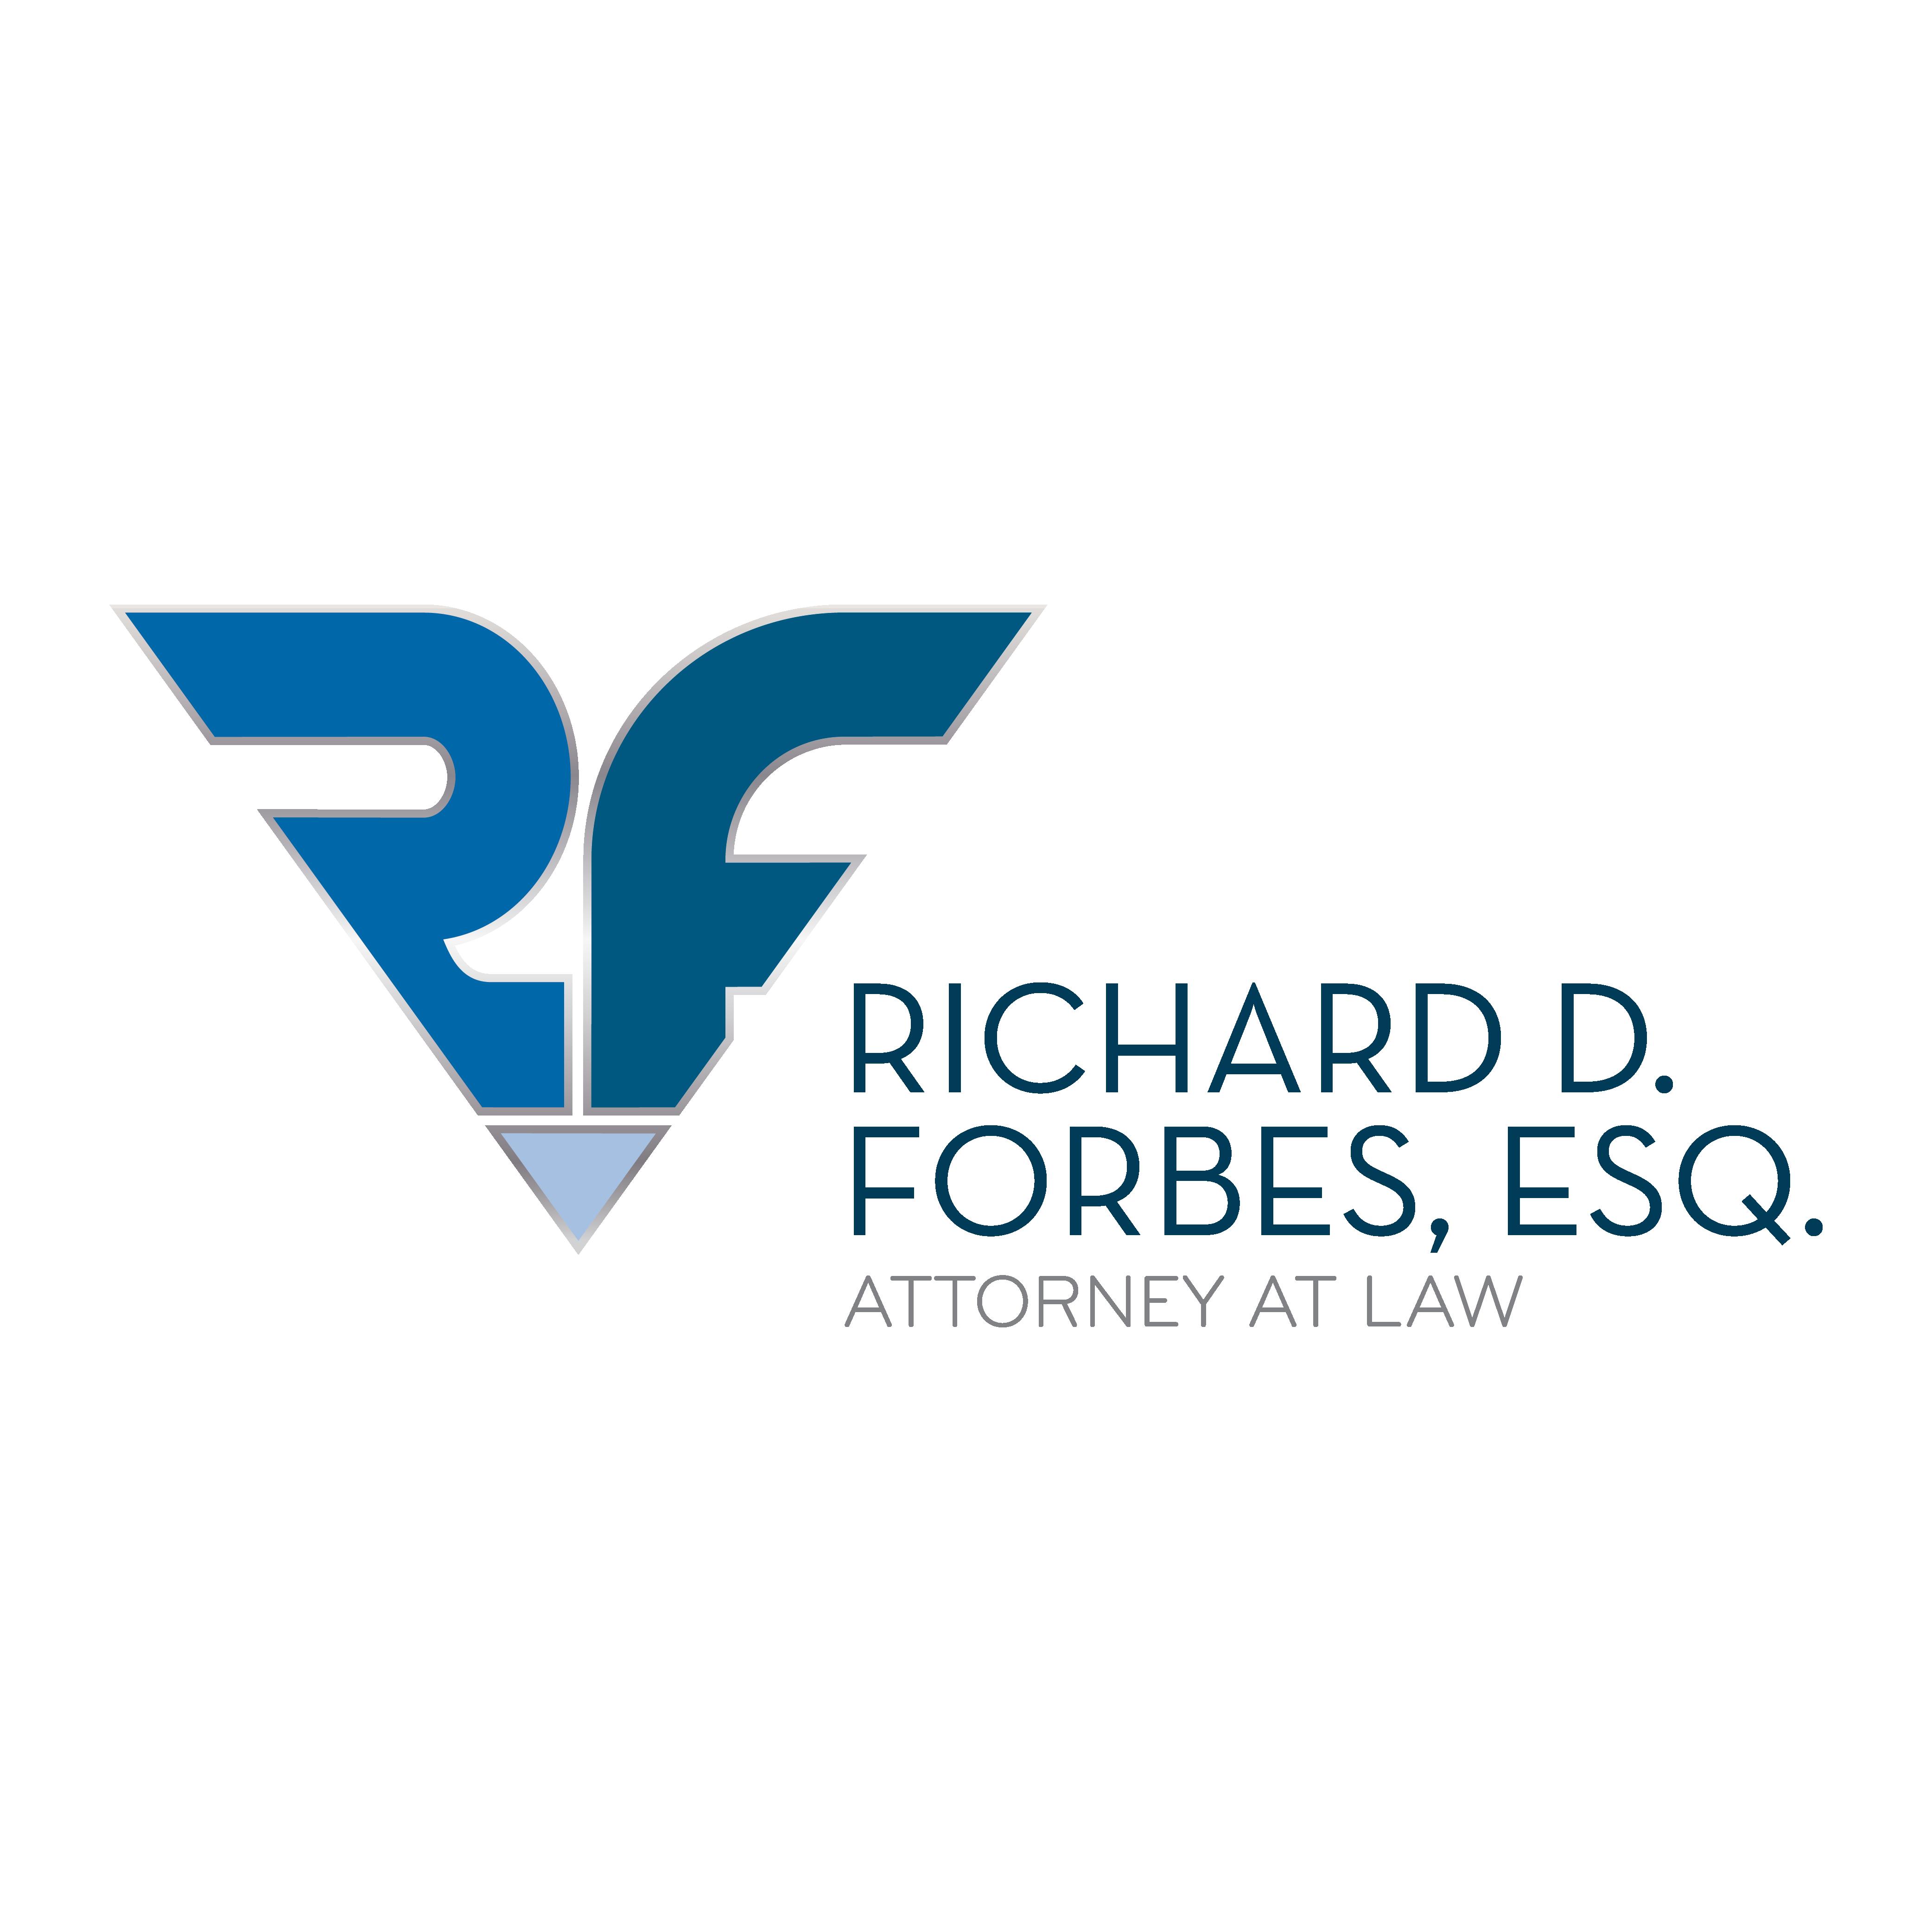 Richard D. Forbes, ESQ. Attorney at law Logo